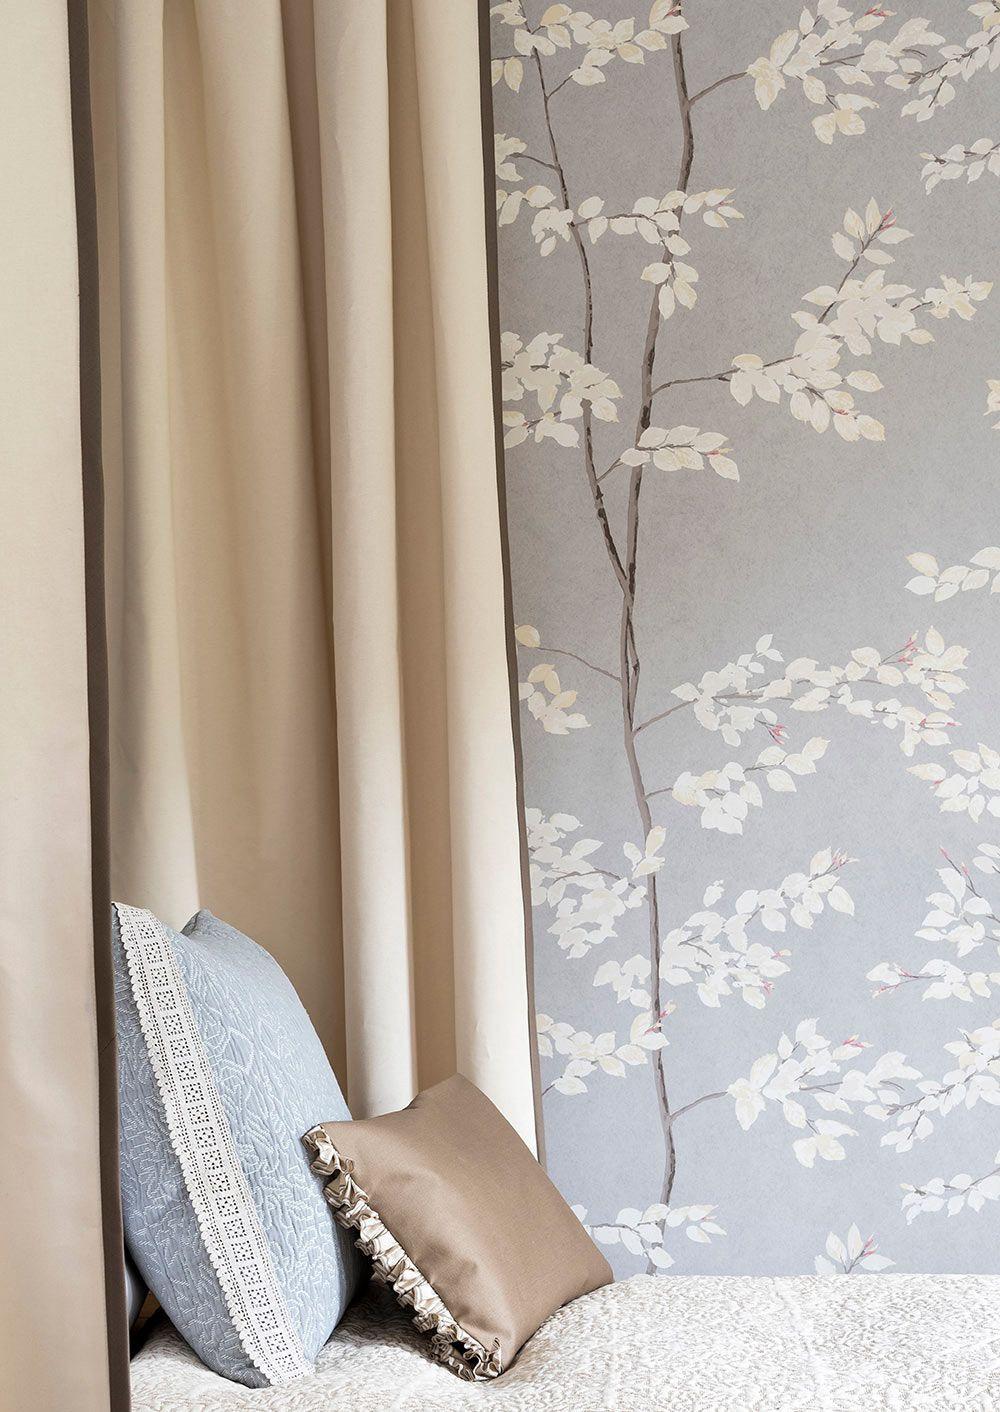 Tree Design Wallpaper Living Room: Home Living Room, Dining Room